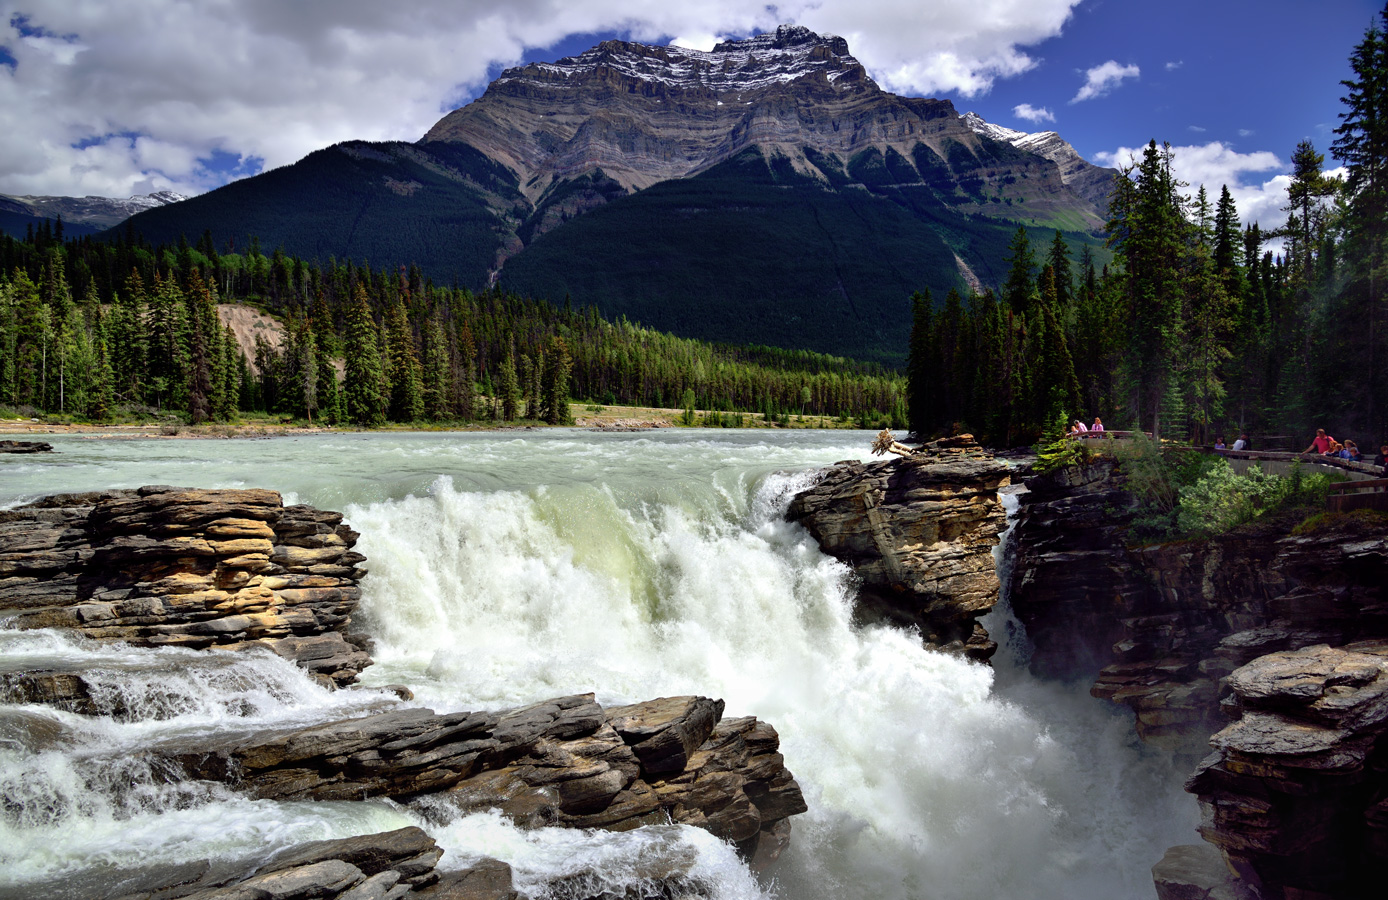 Wallpaper Of Water Fall Jasper National Park Canada Ancient Origins